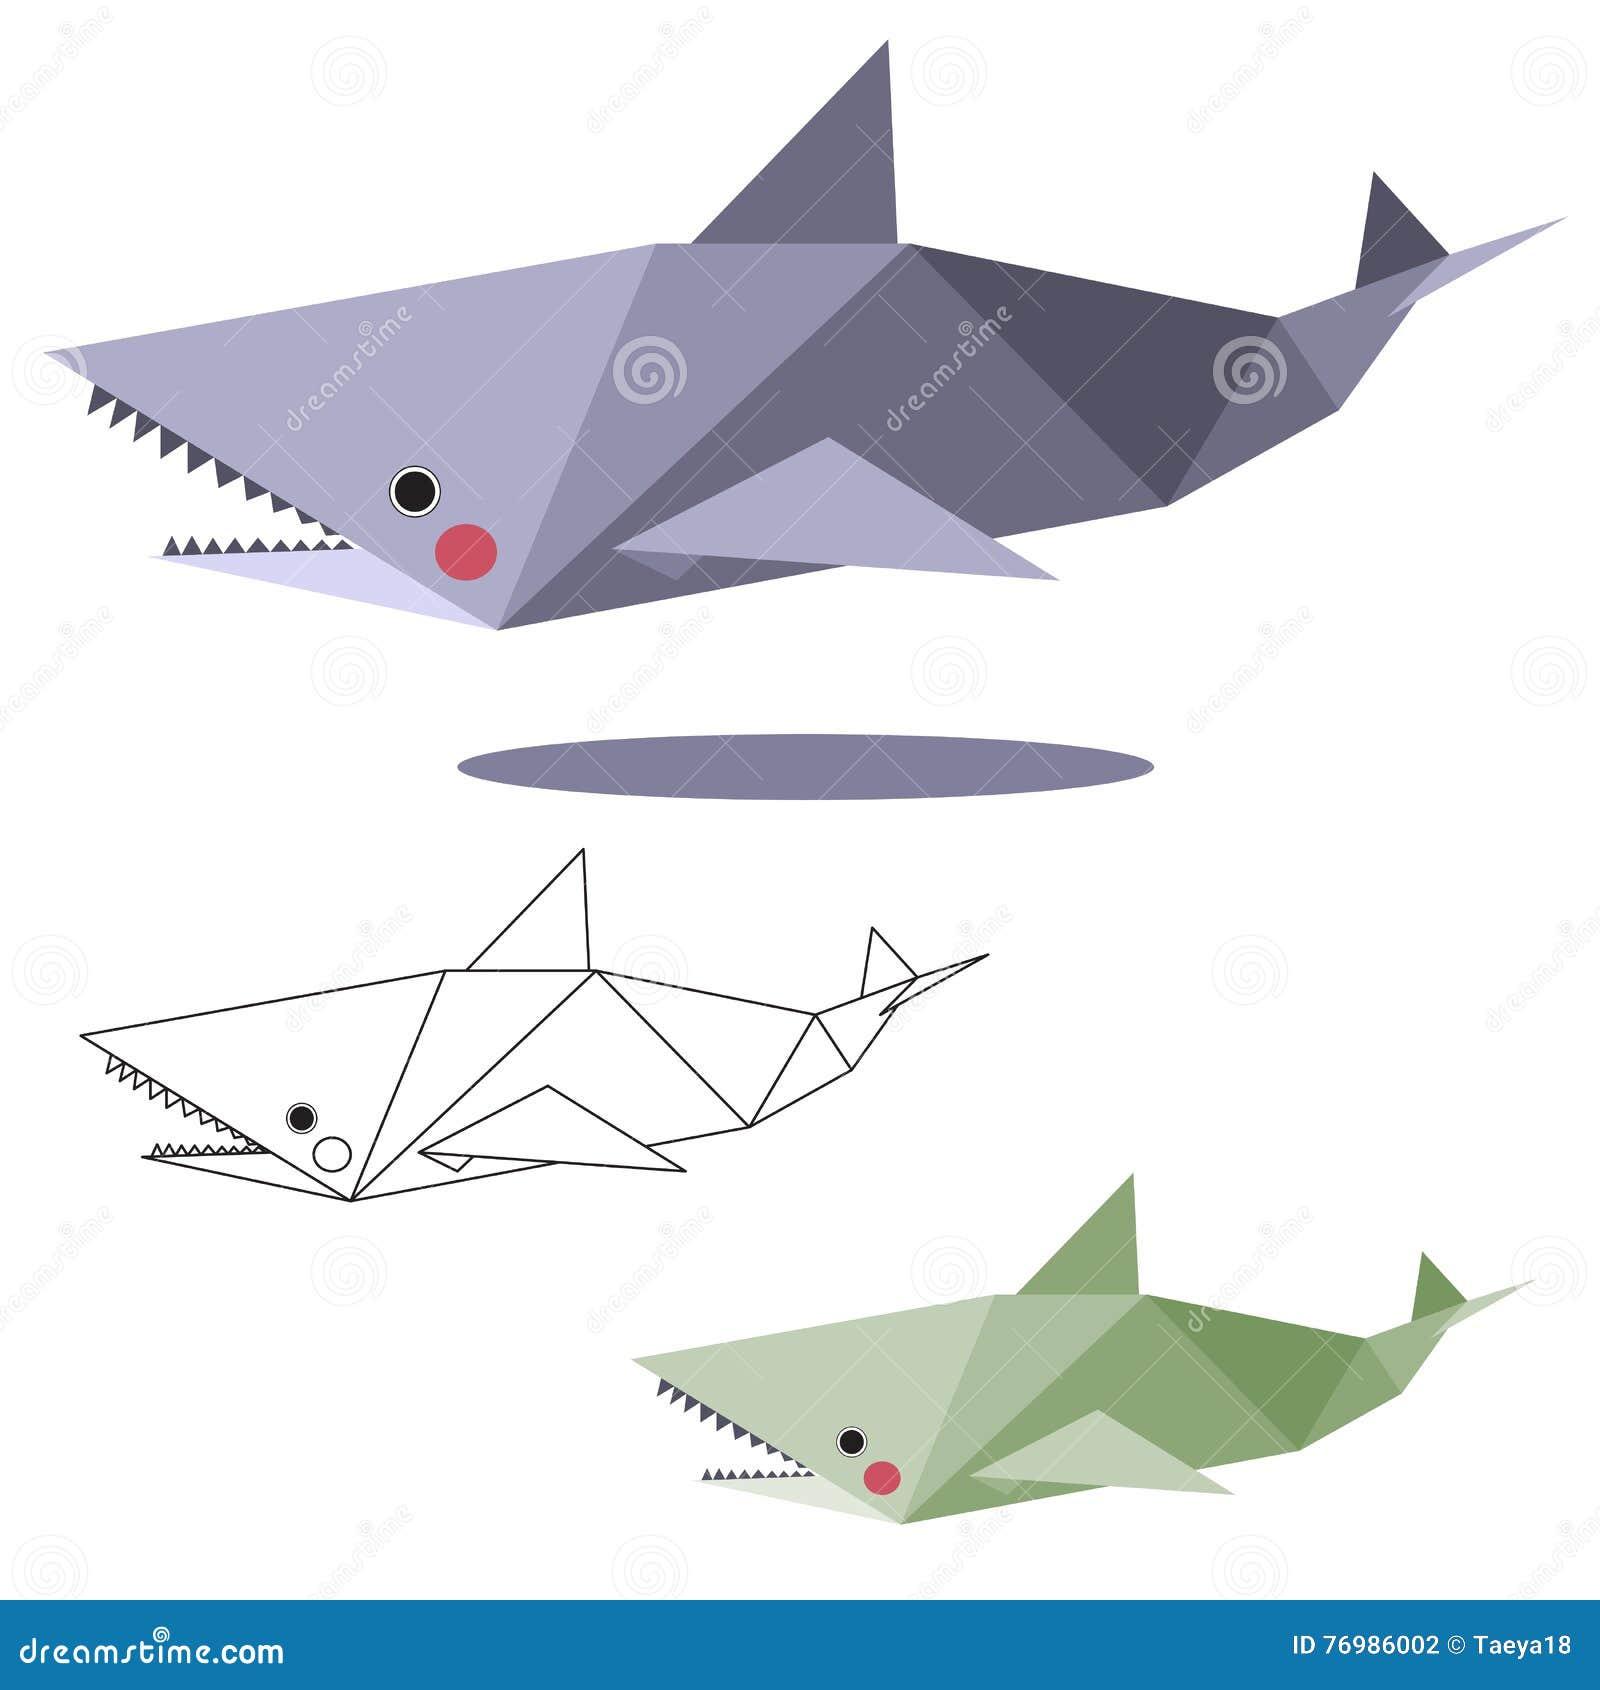 Shark Low Polygon Stock Vector Illustration Of Decorative 76986002